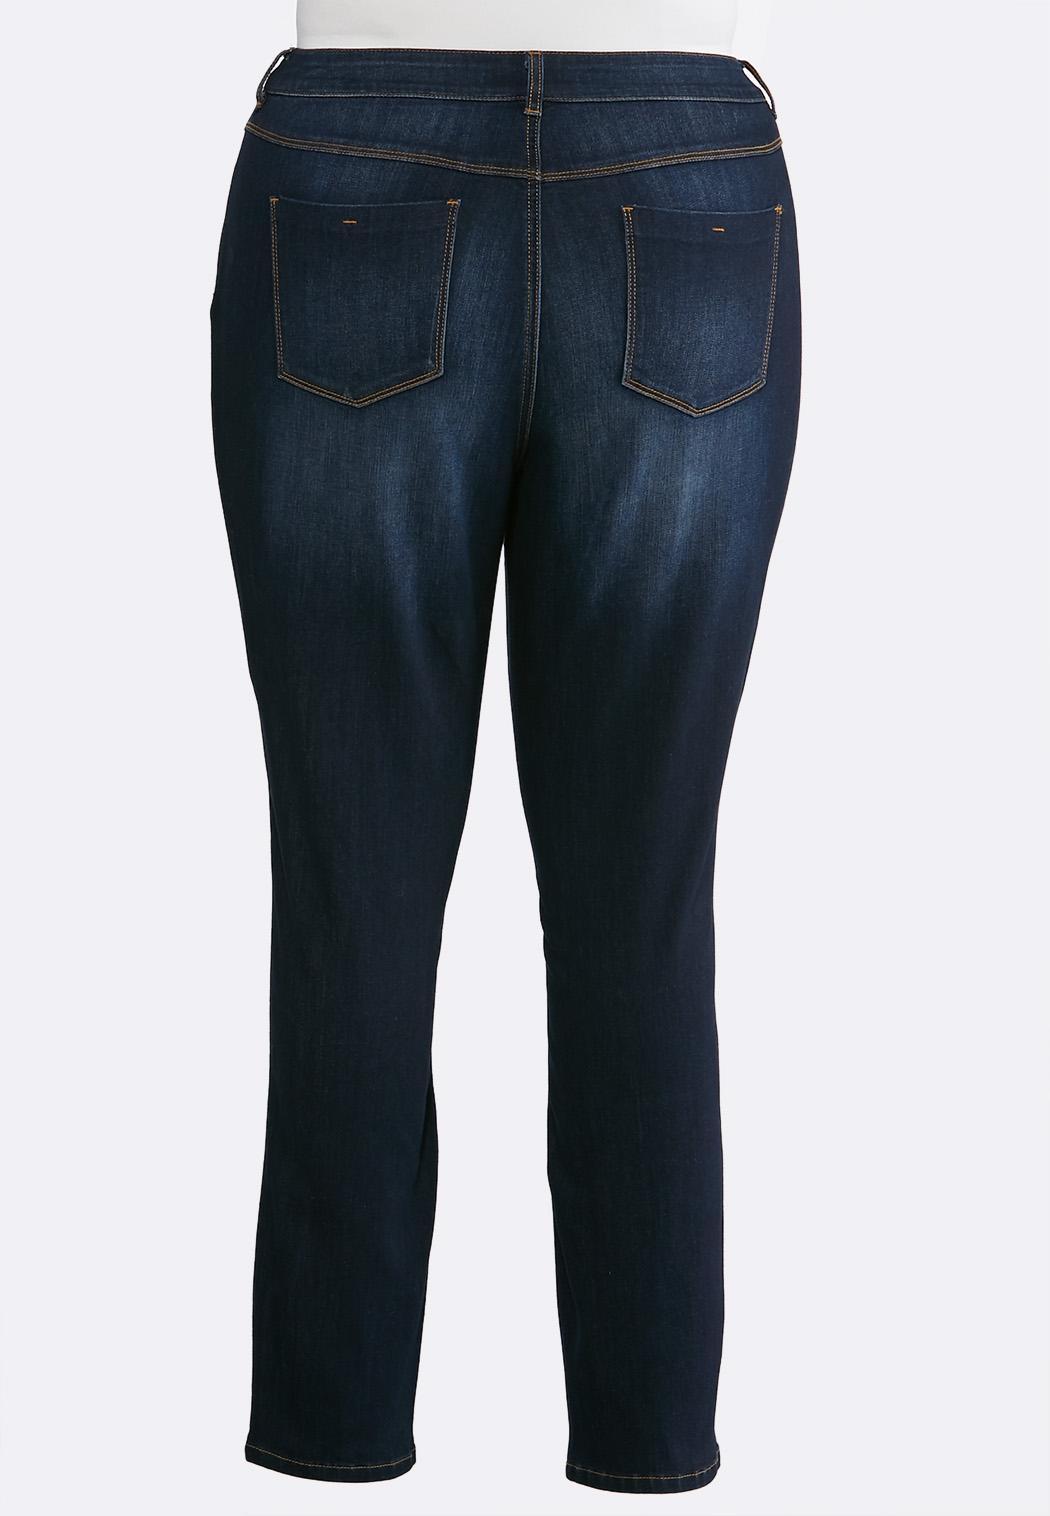 Plus Size Dark Denim Jeans (Item #43664995)